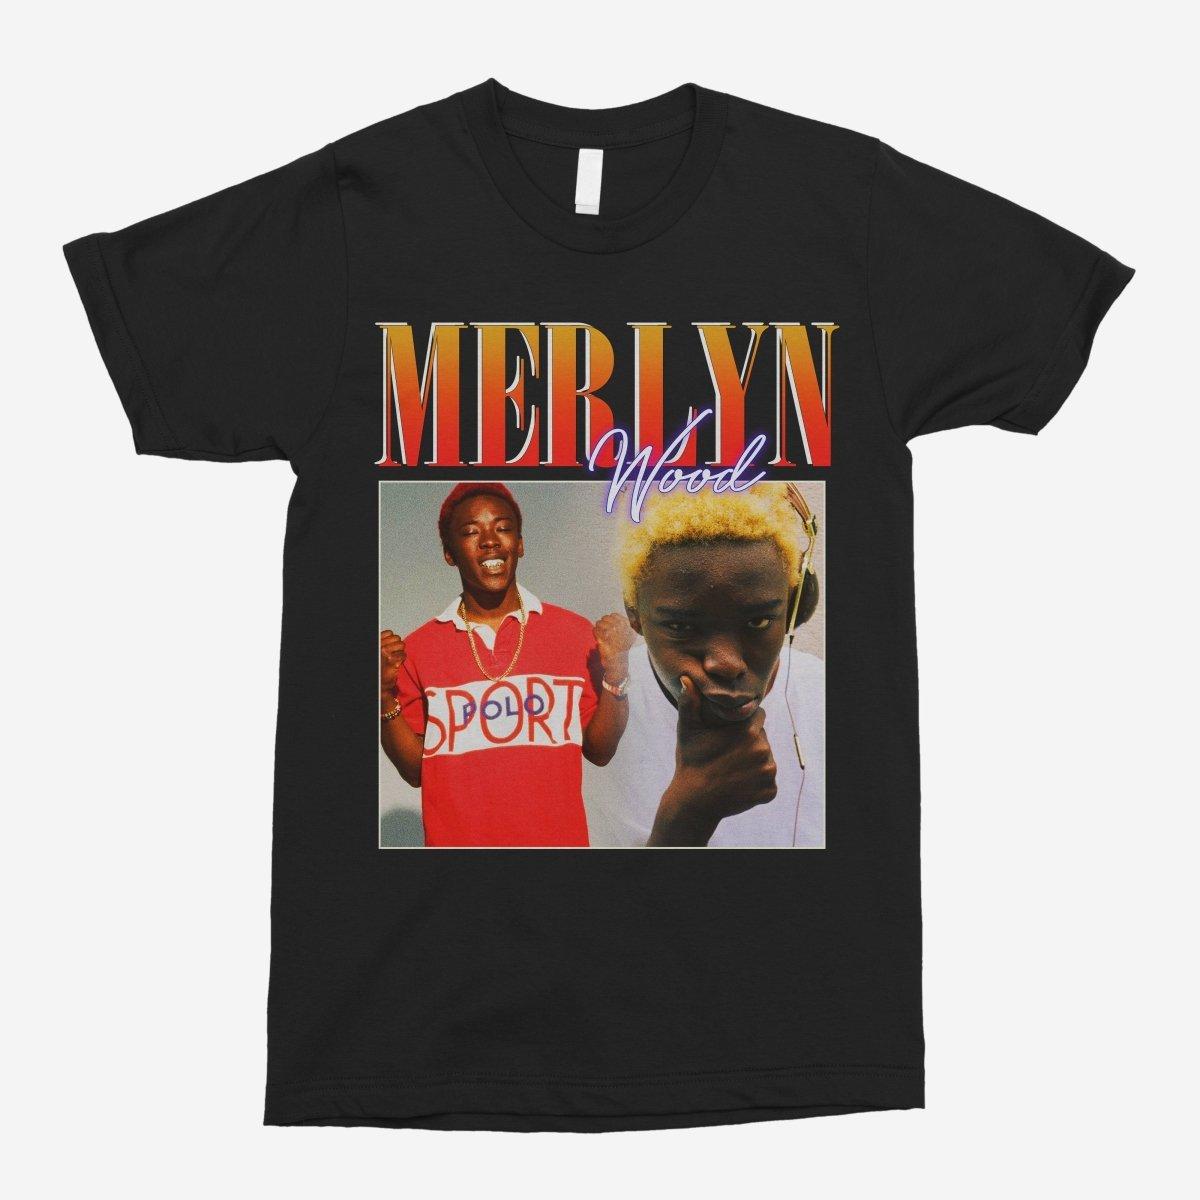 Merlyn Wood Vintage Unisex T-Shirt